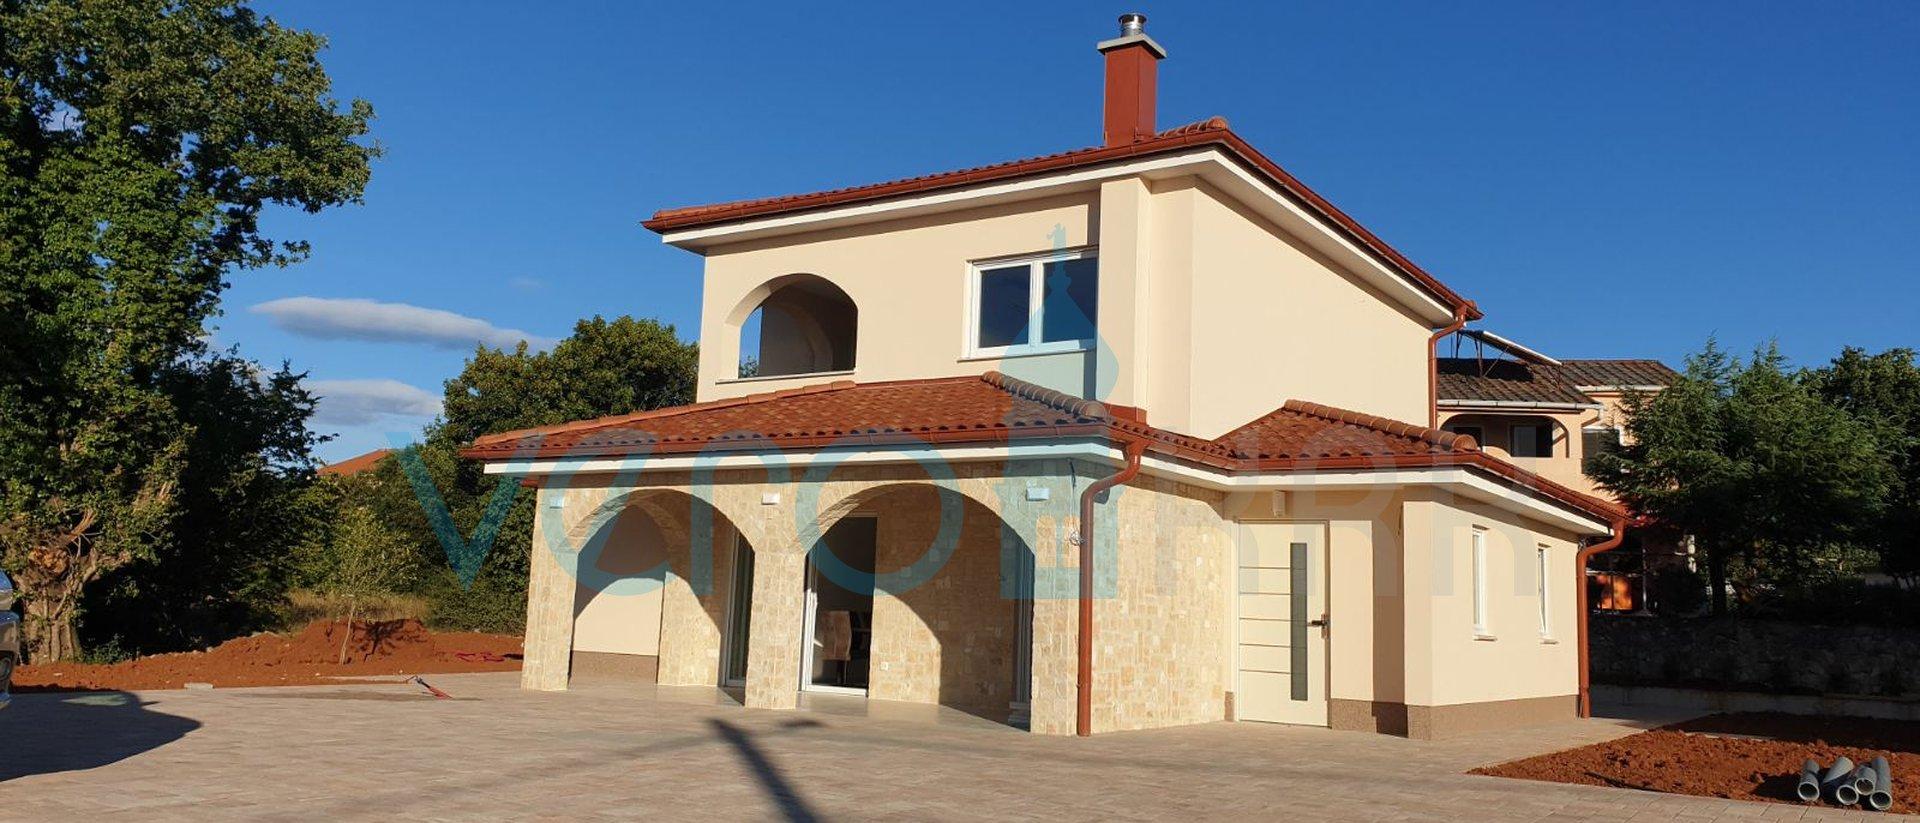 Rasopasno, isola di Krk, moderna casa prefabbricata indipendente a basso consumo energetico